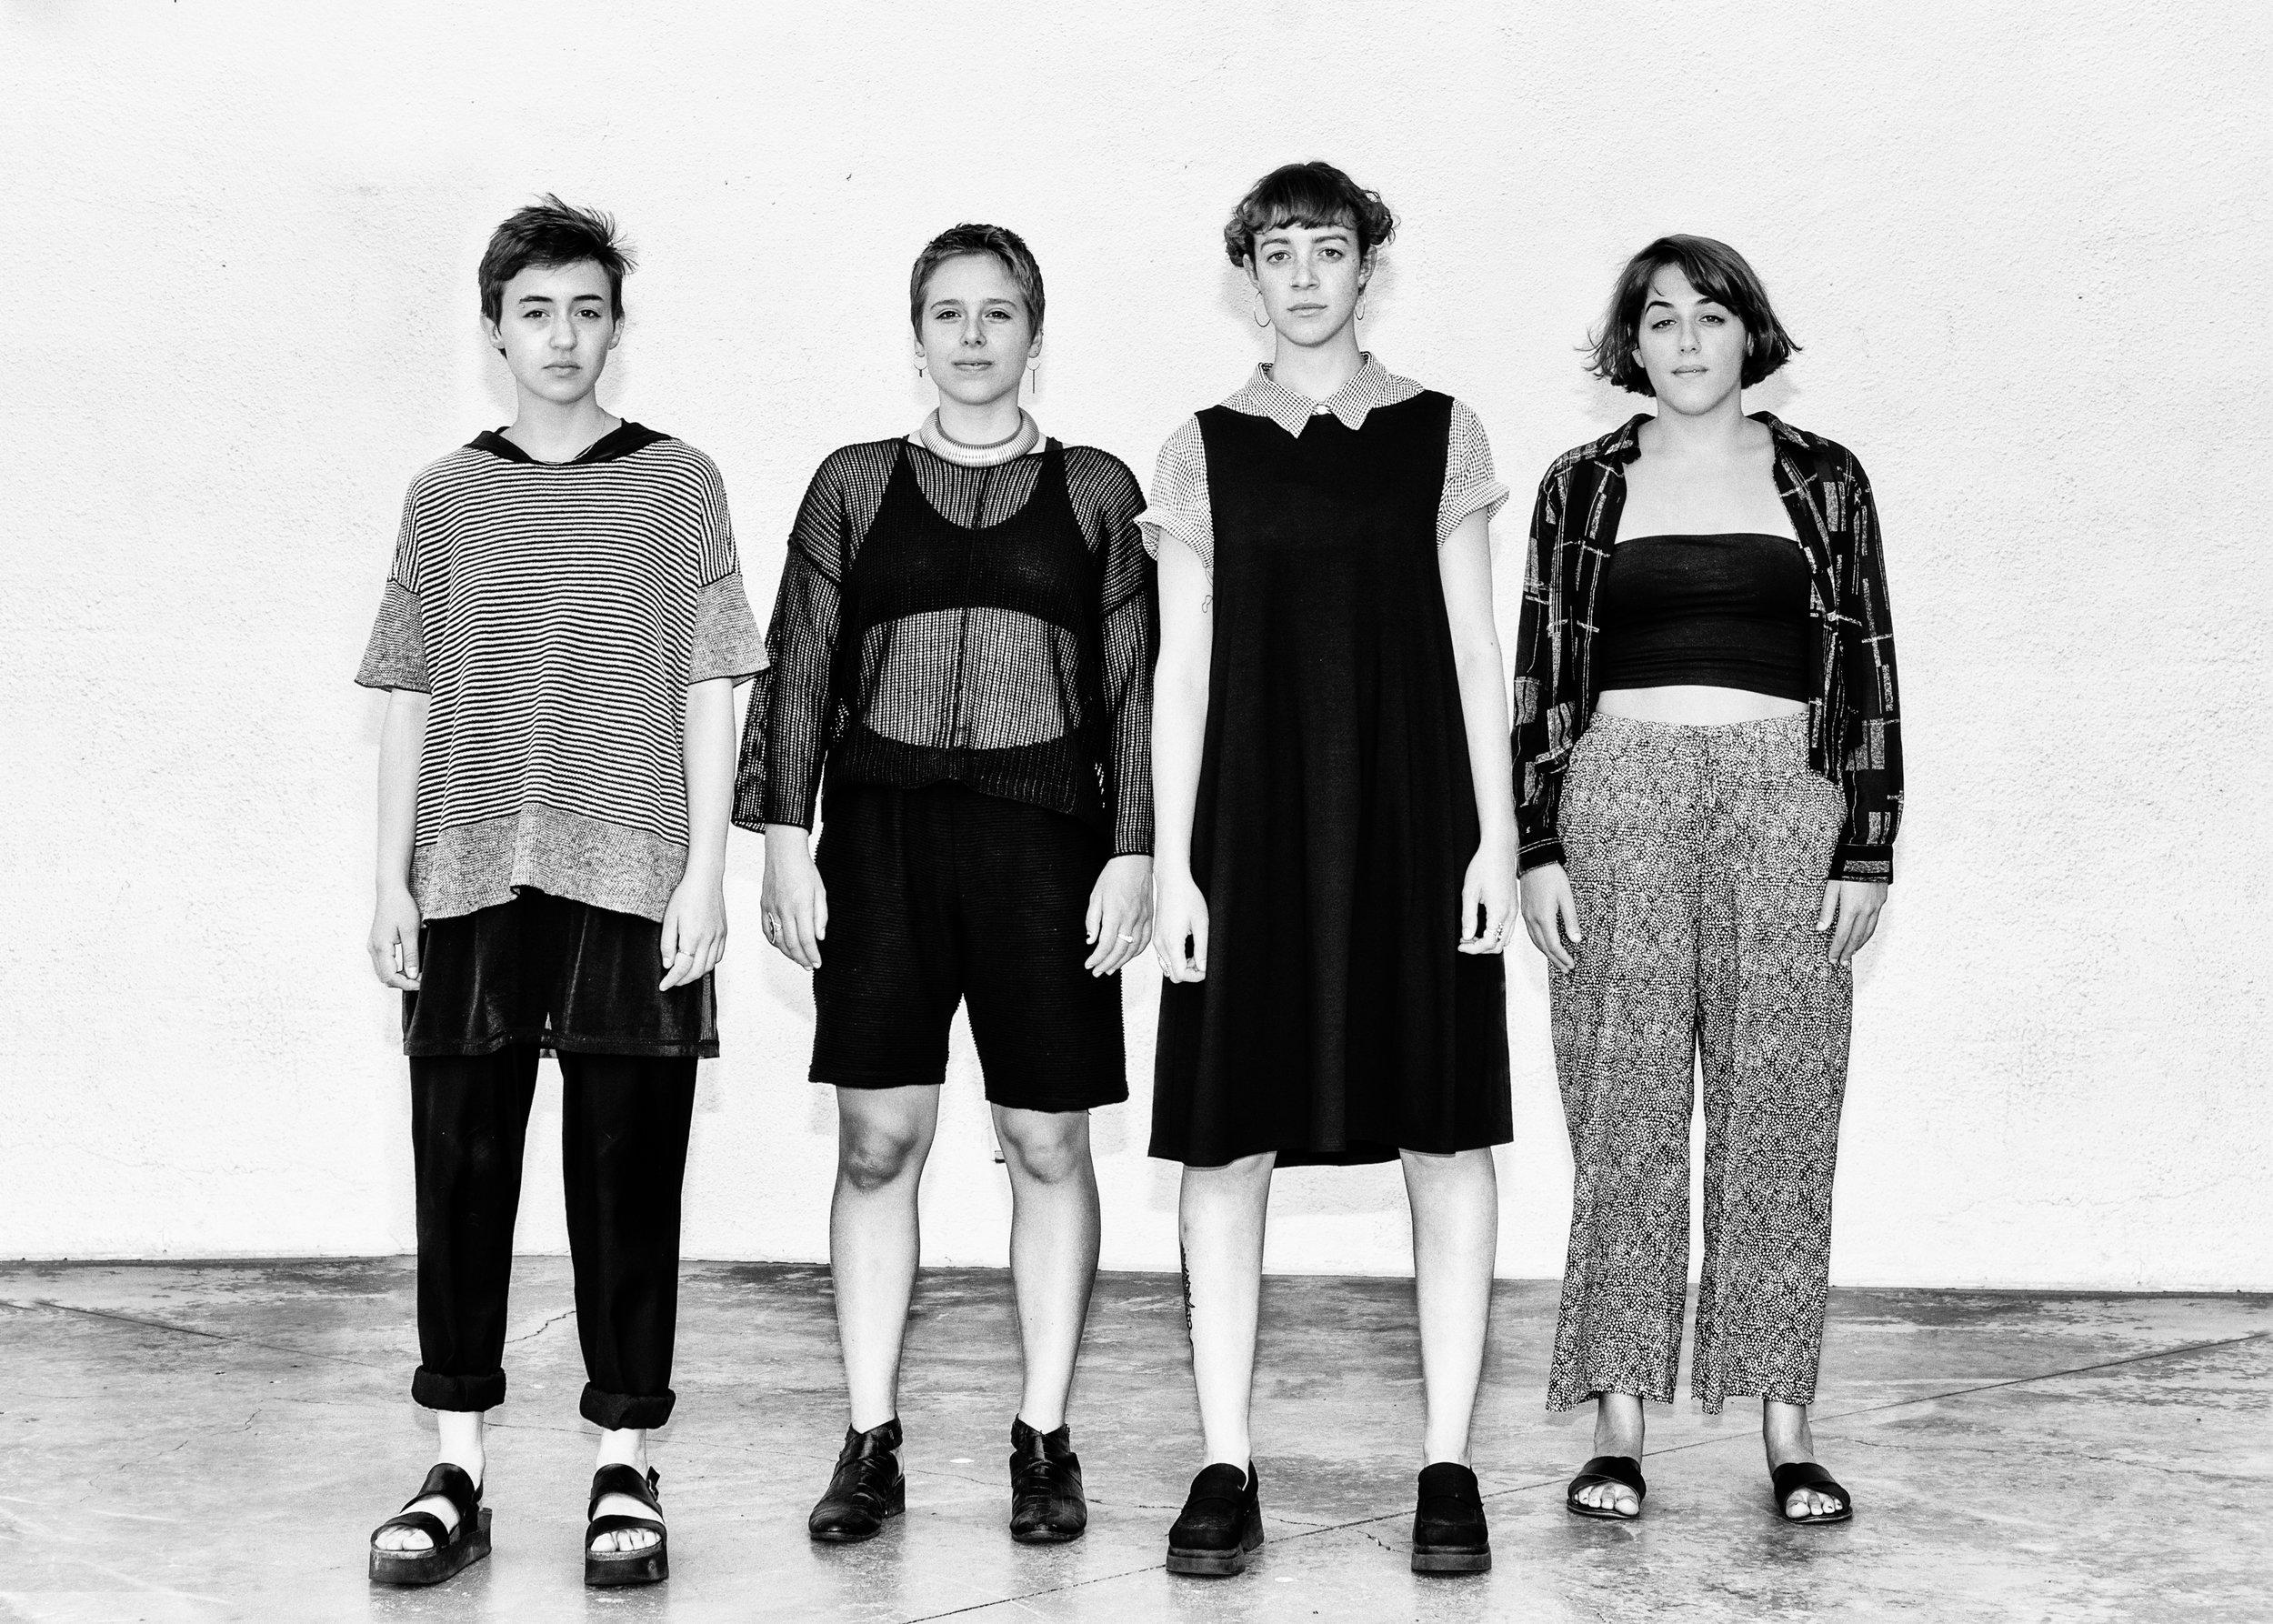 From left to right: Emma Bergman, E Cadoux, Mia Massimino, Sophie Goldberg